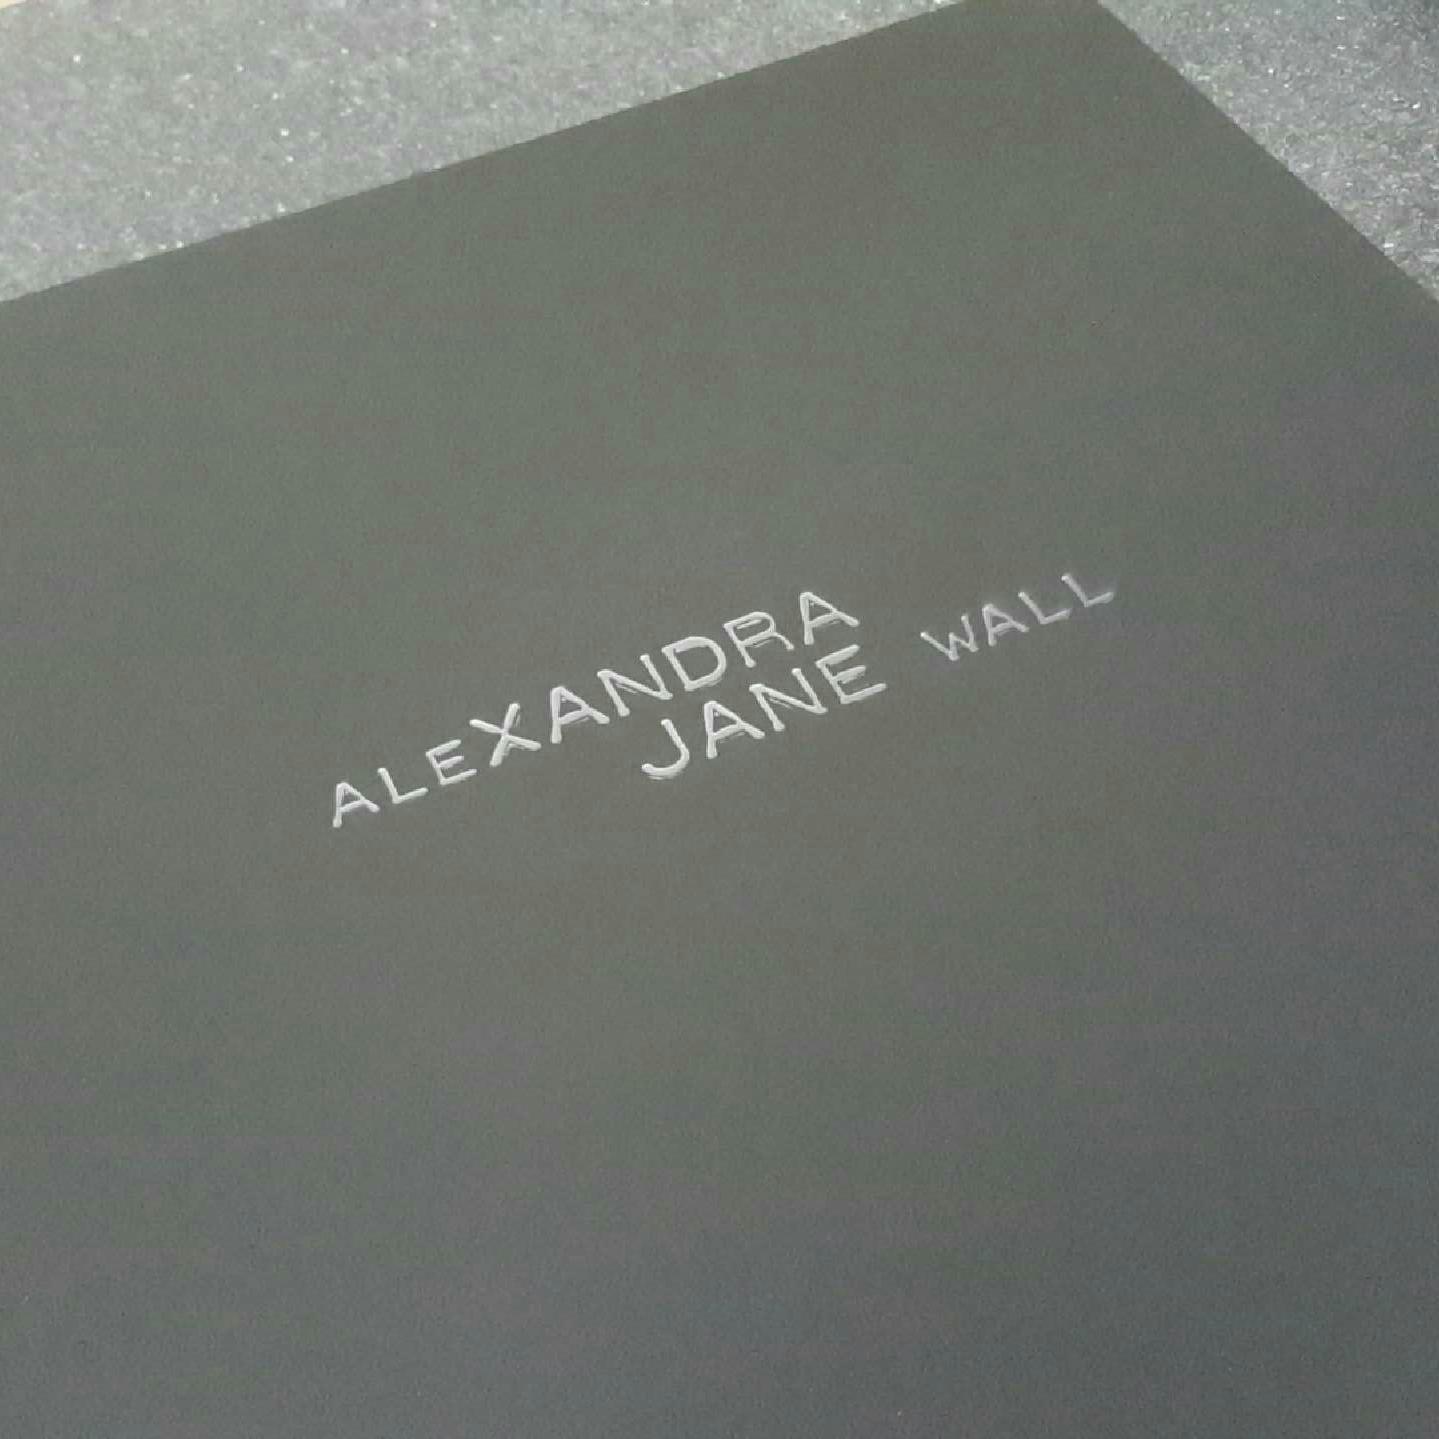 matt black acrylic perspex black display portfolio album with logo engravinghttps://www.my-folio.com/acrylicperspexportfolios/